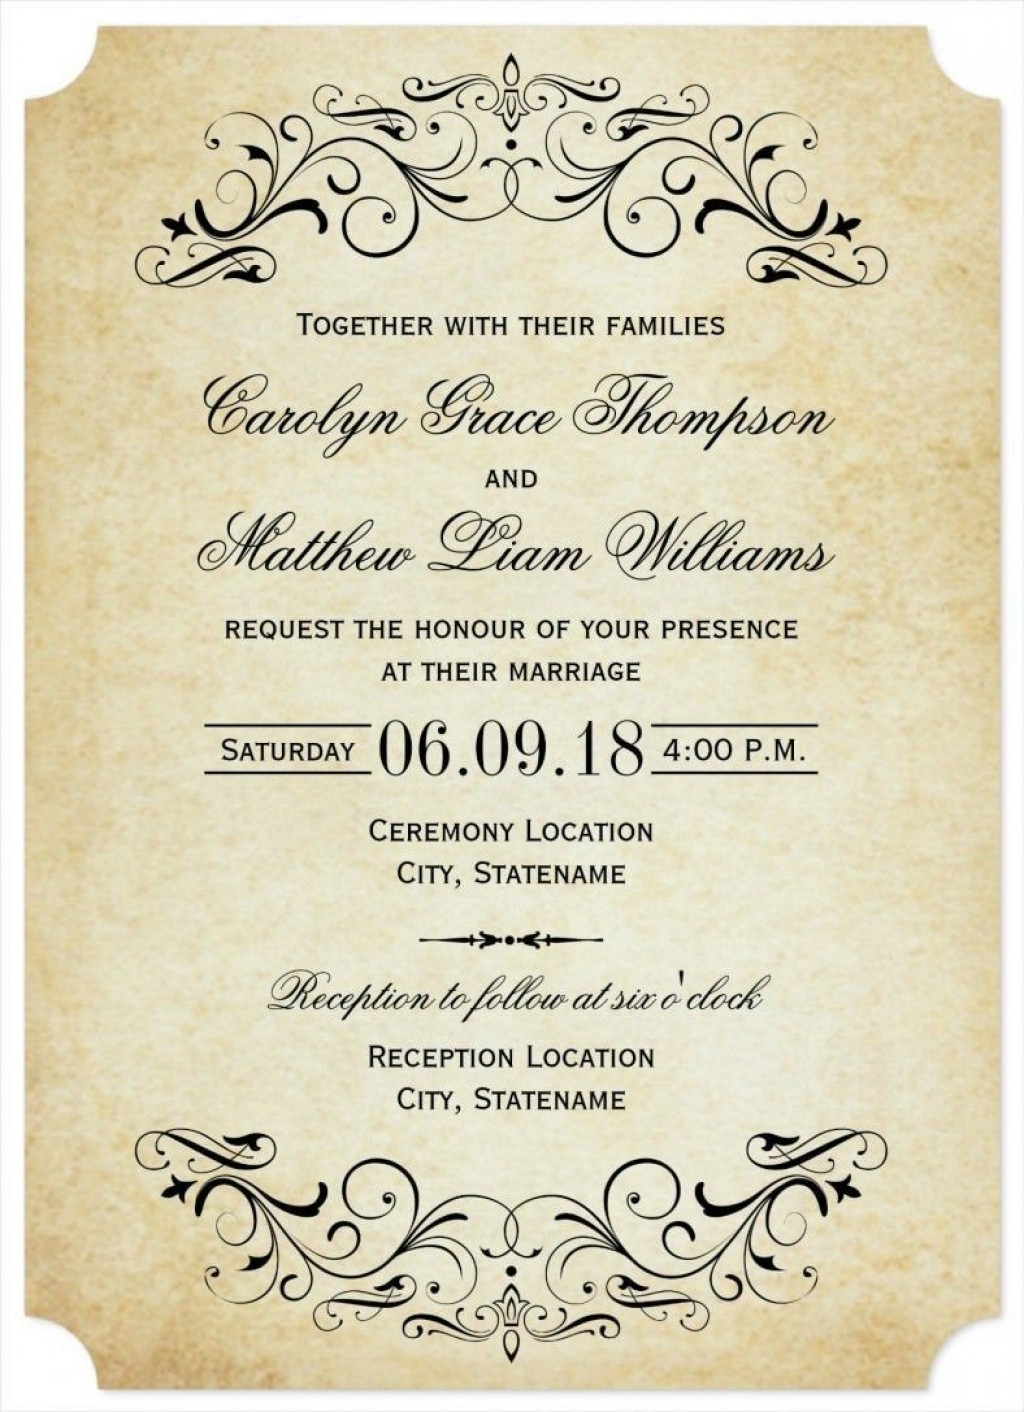 007 Astounding Formal Wedding Invitation Template Free Design Large